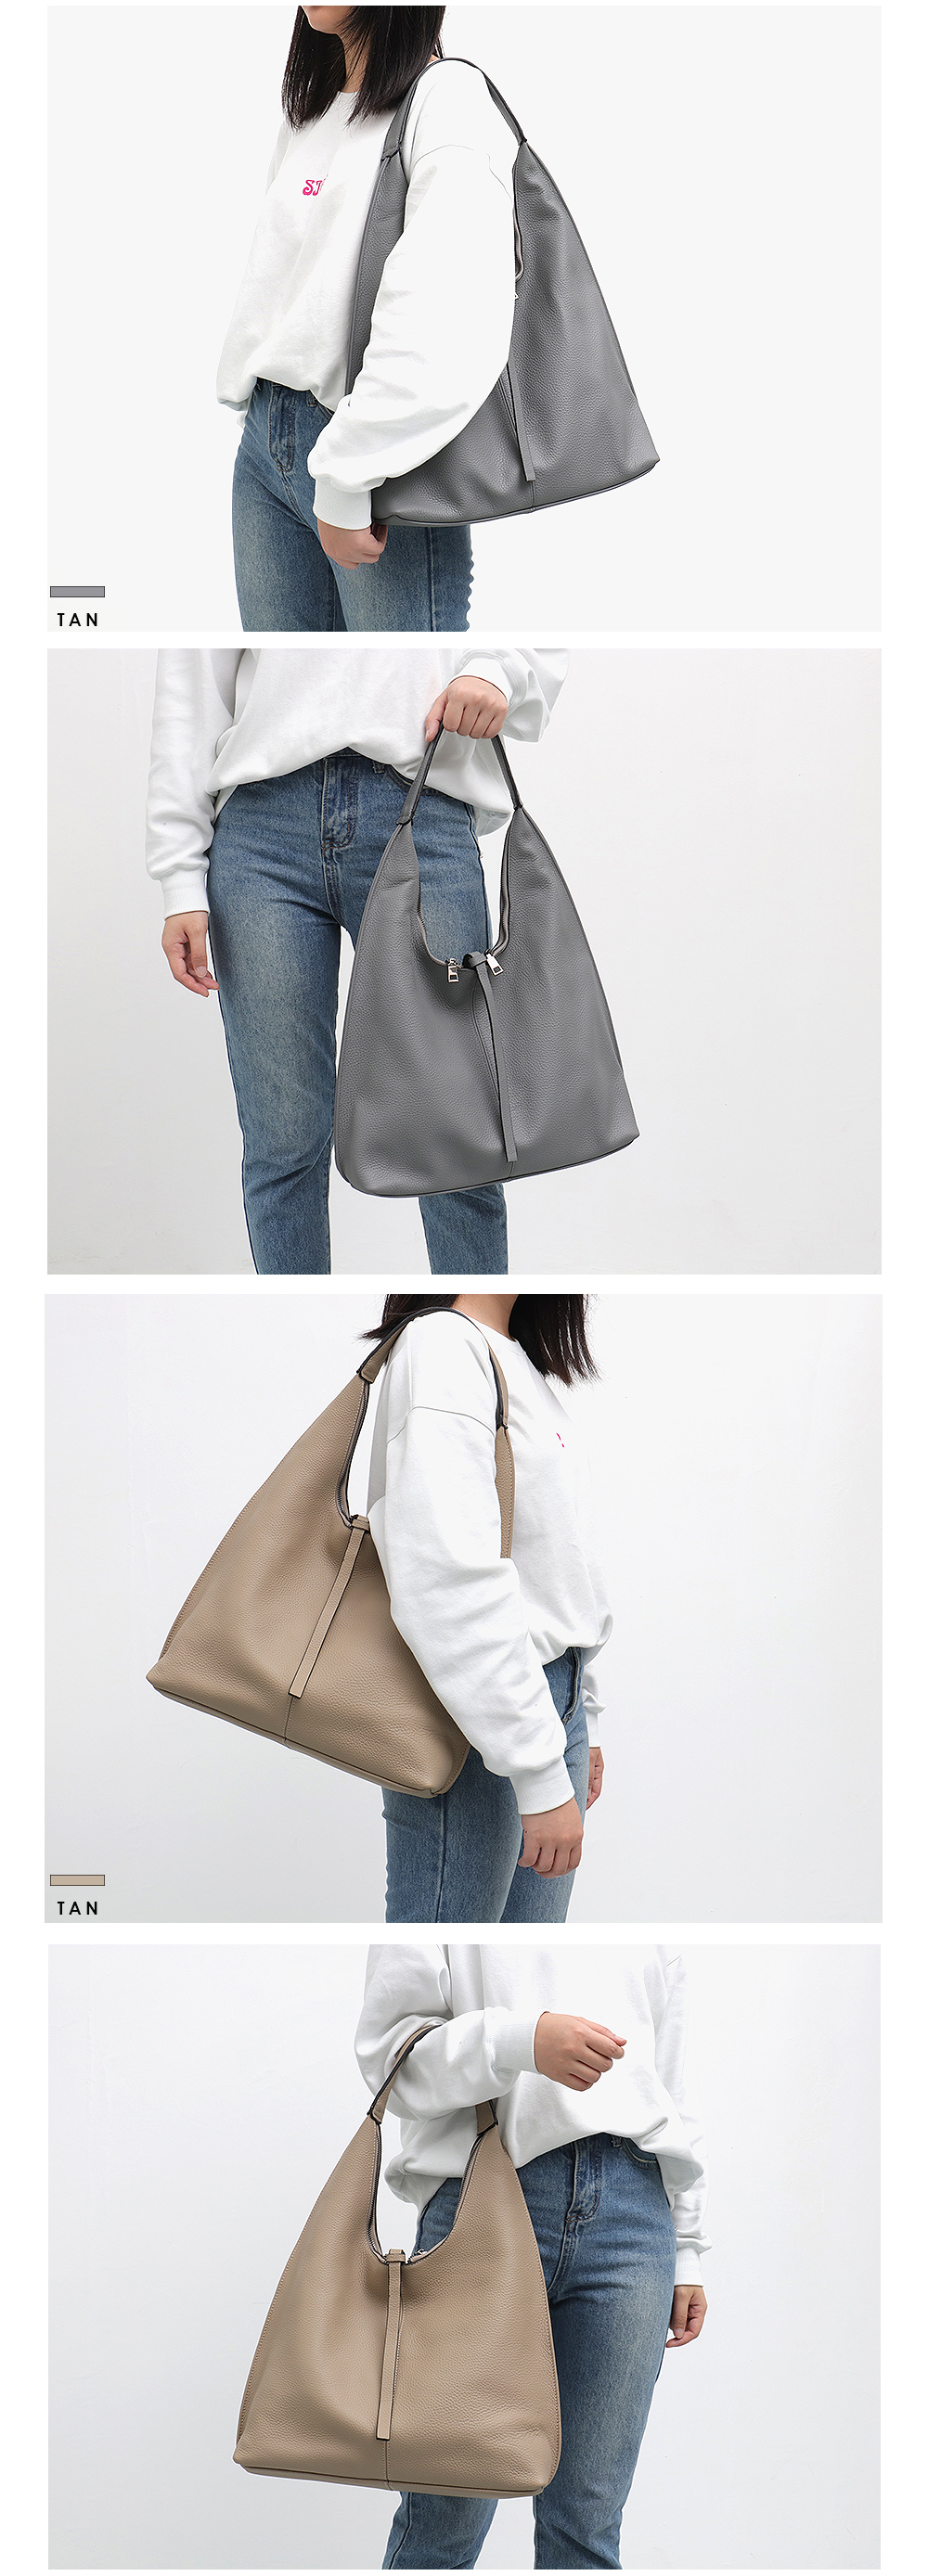 Sc couro genuíno hobo sacos das mulheres